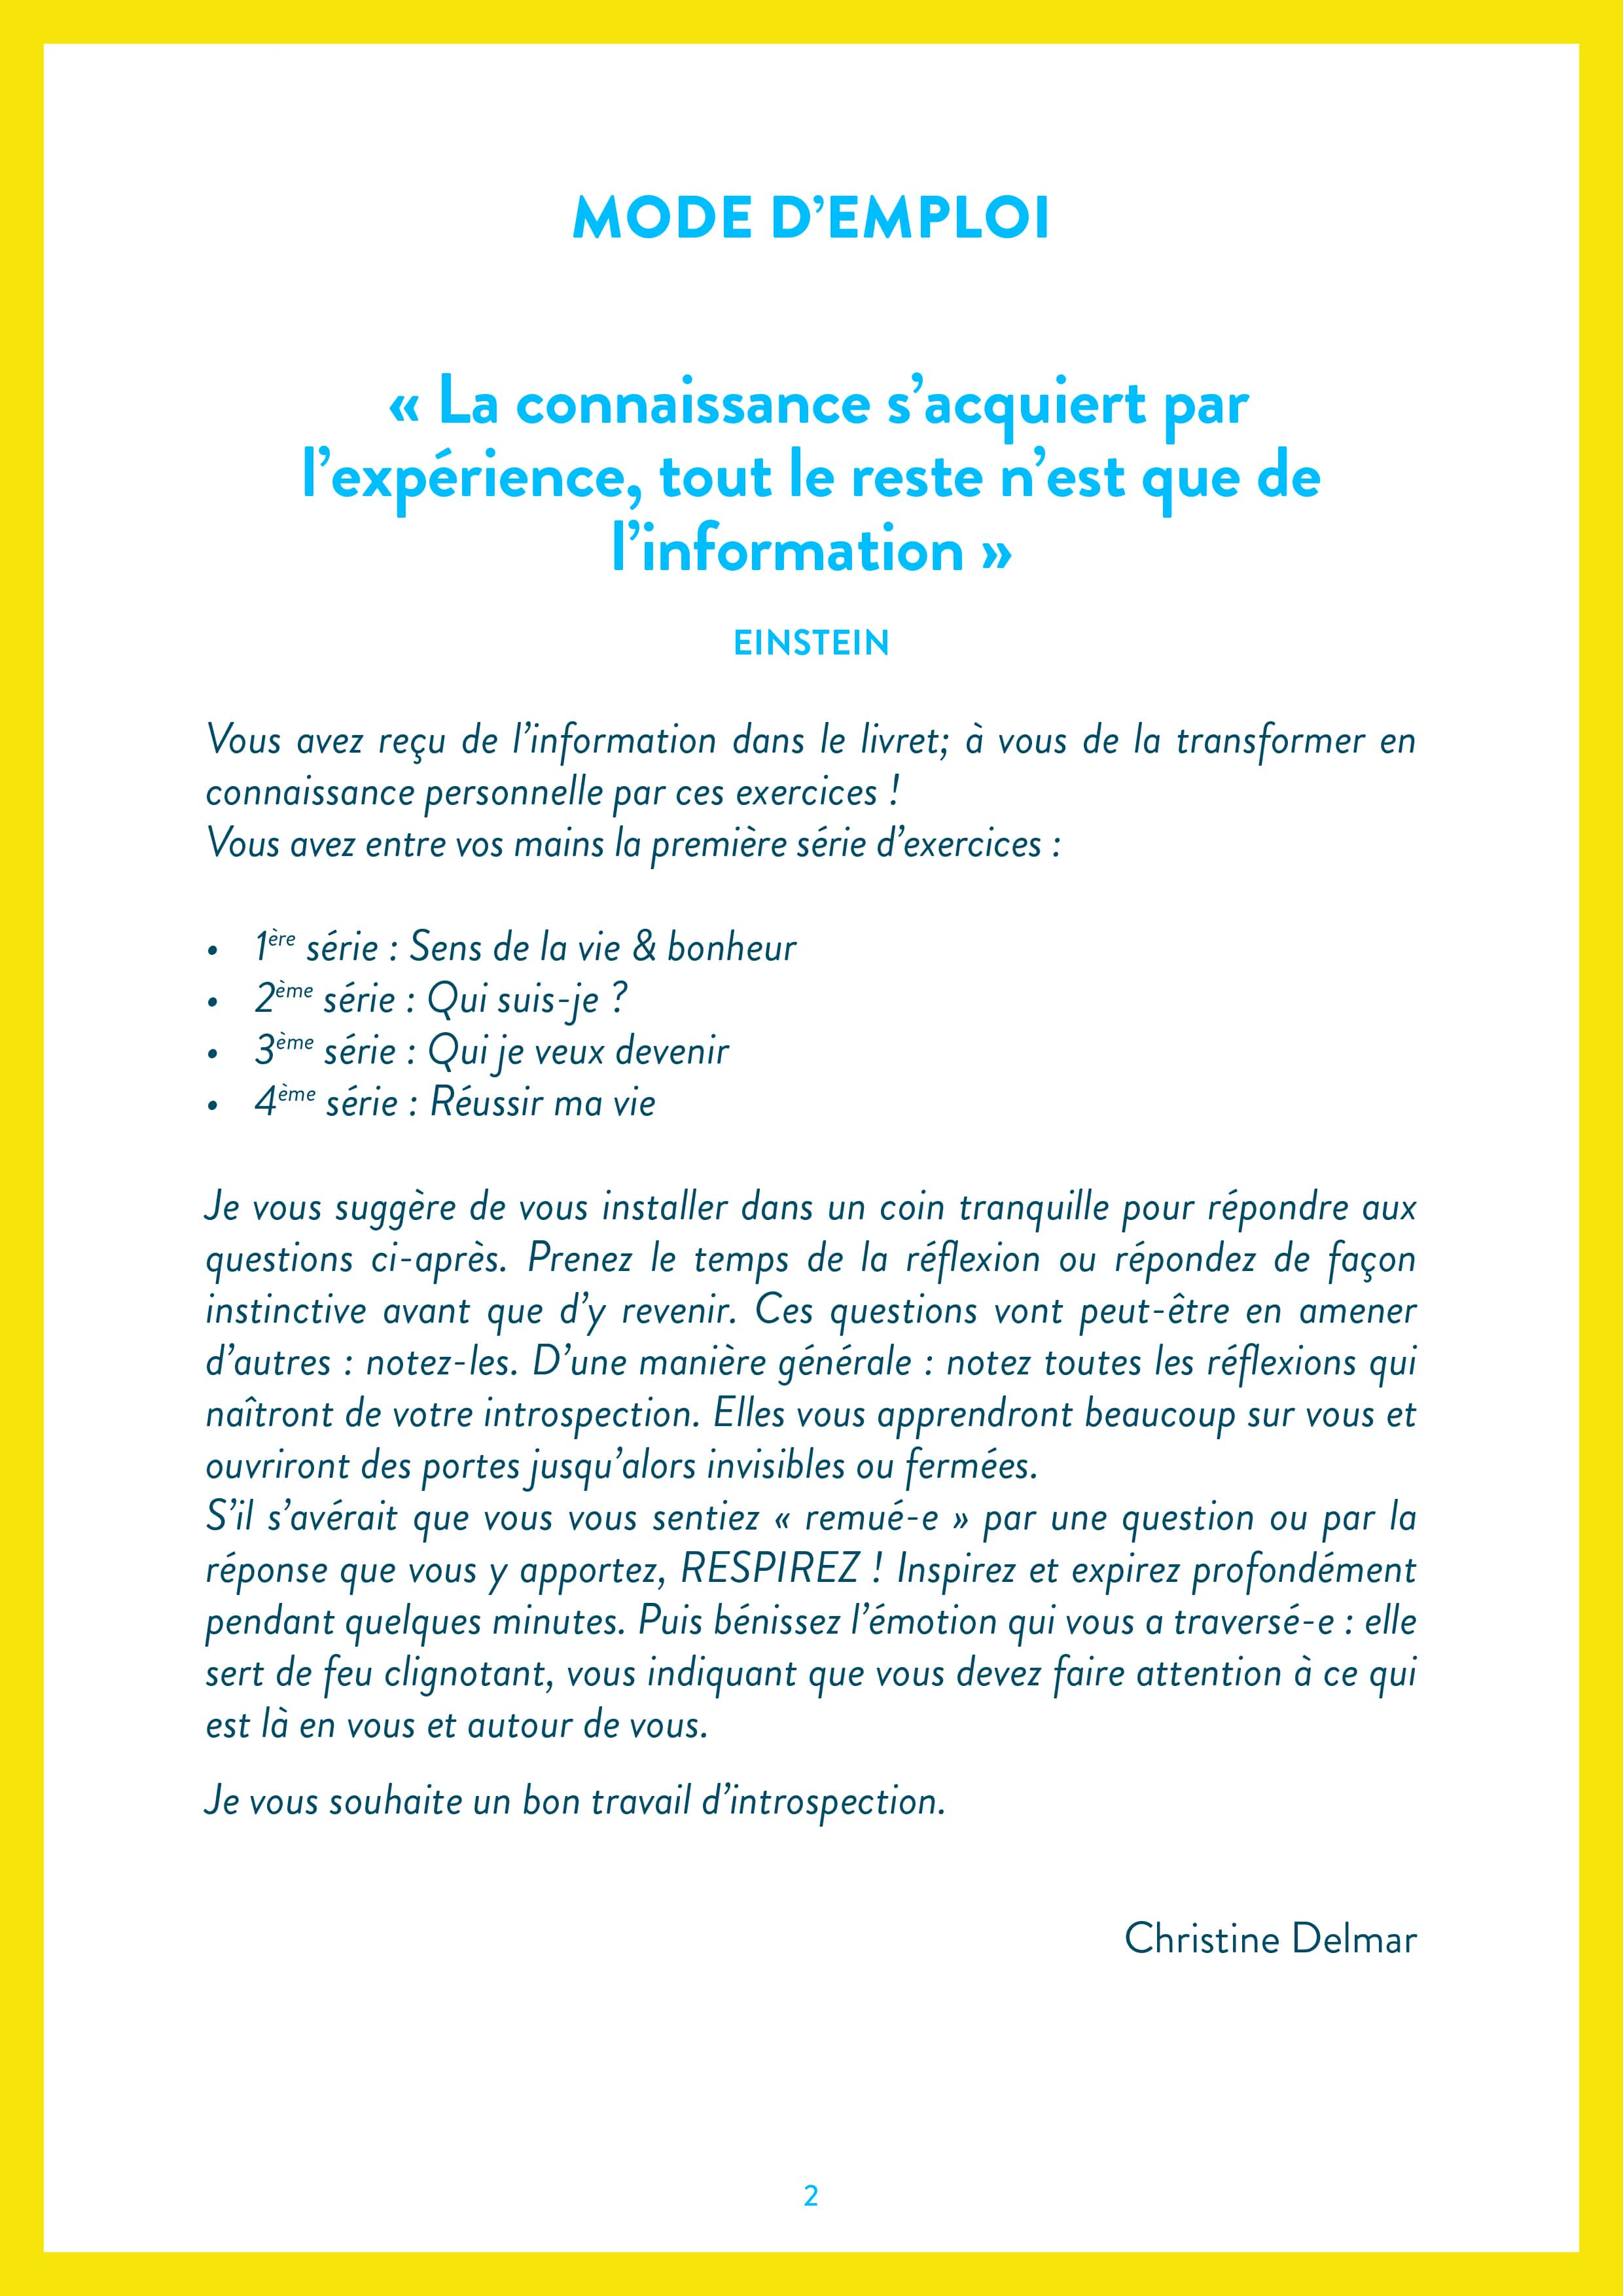 E-coaching-Cahierdexo-serie1-2.jpg